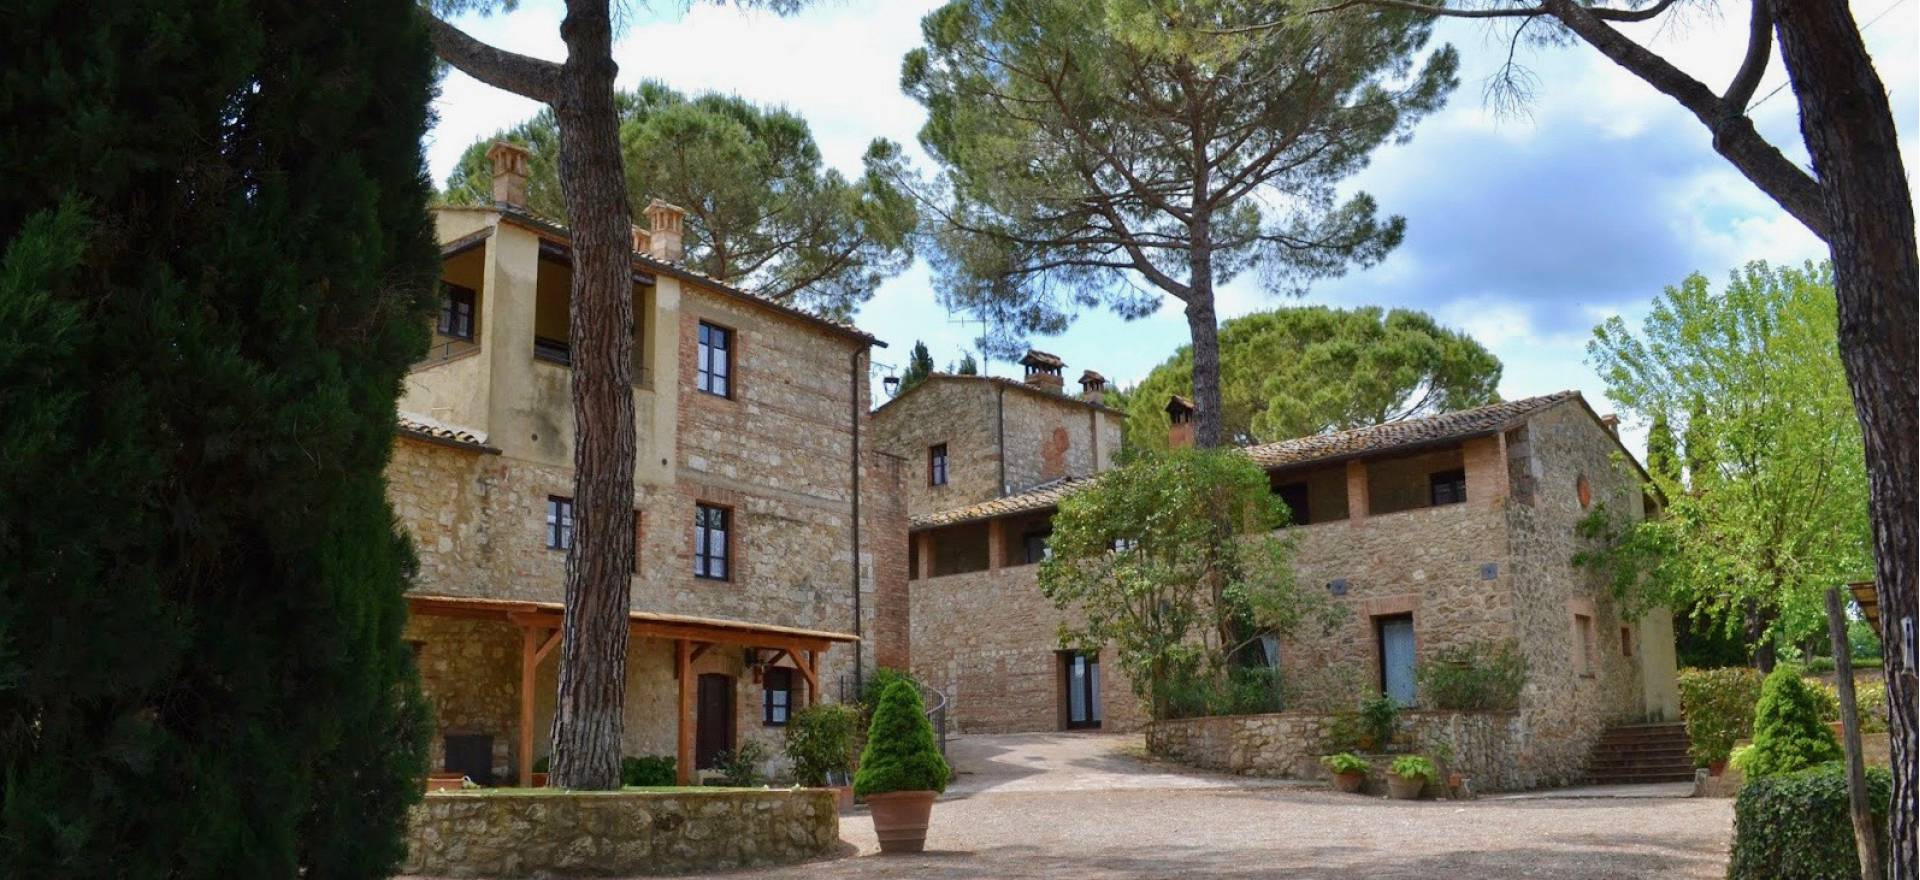 Agriturismo Toscana Caratteristico agriturismo in zona centrale, Toscana